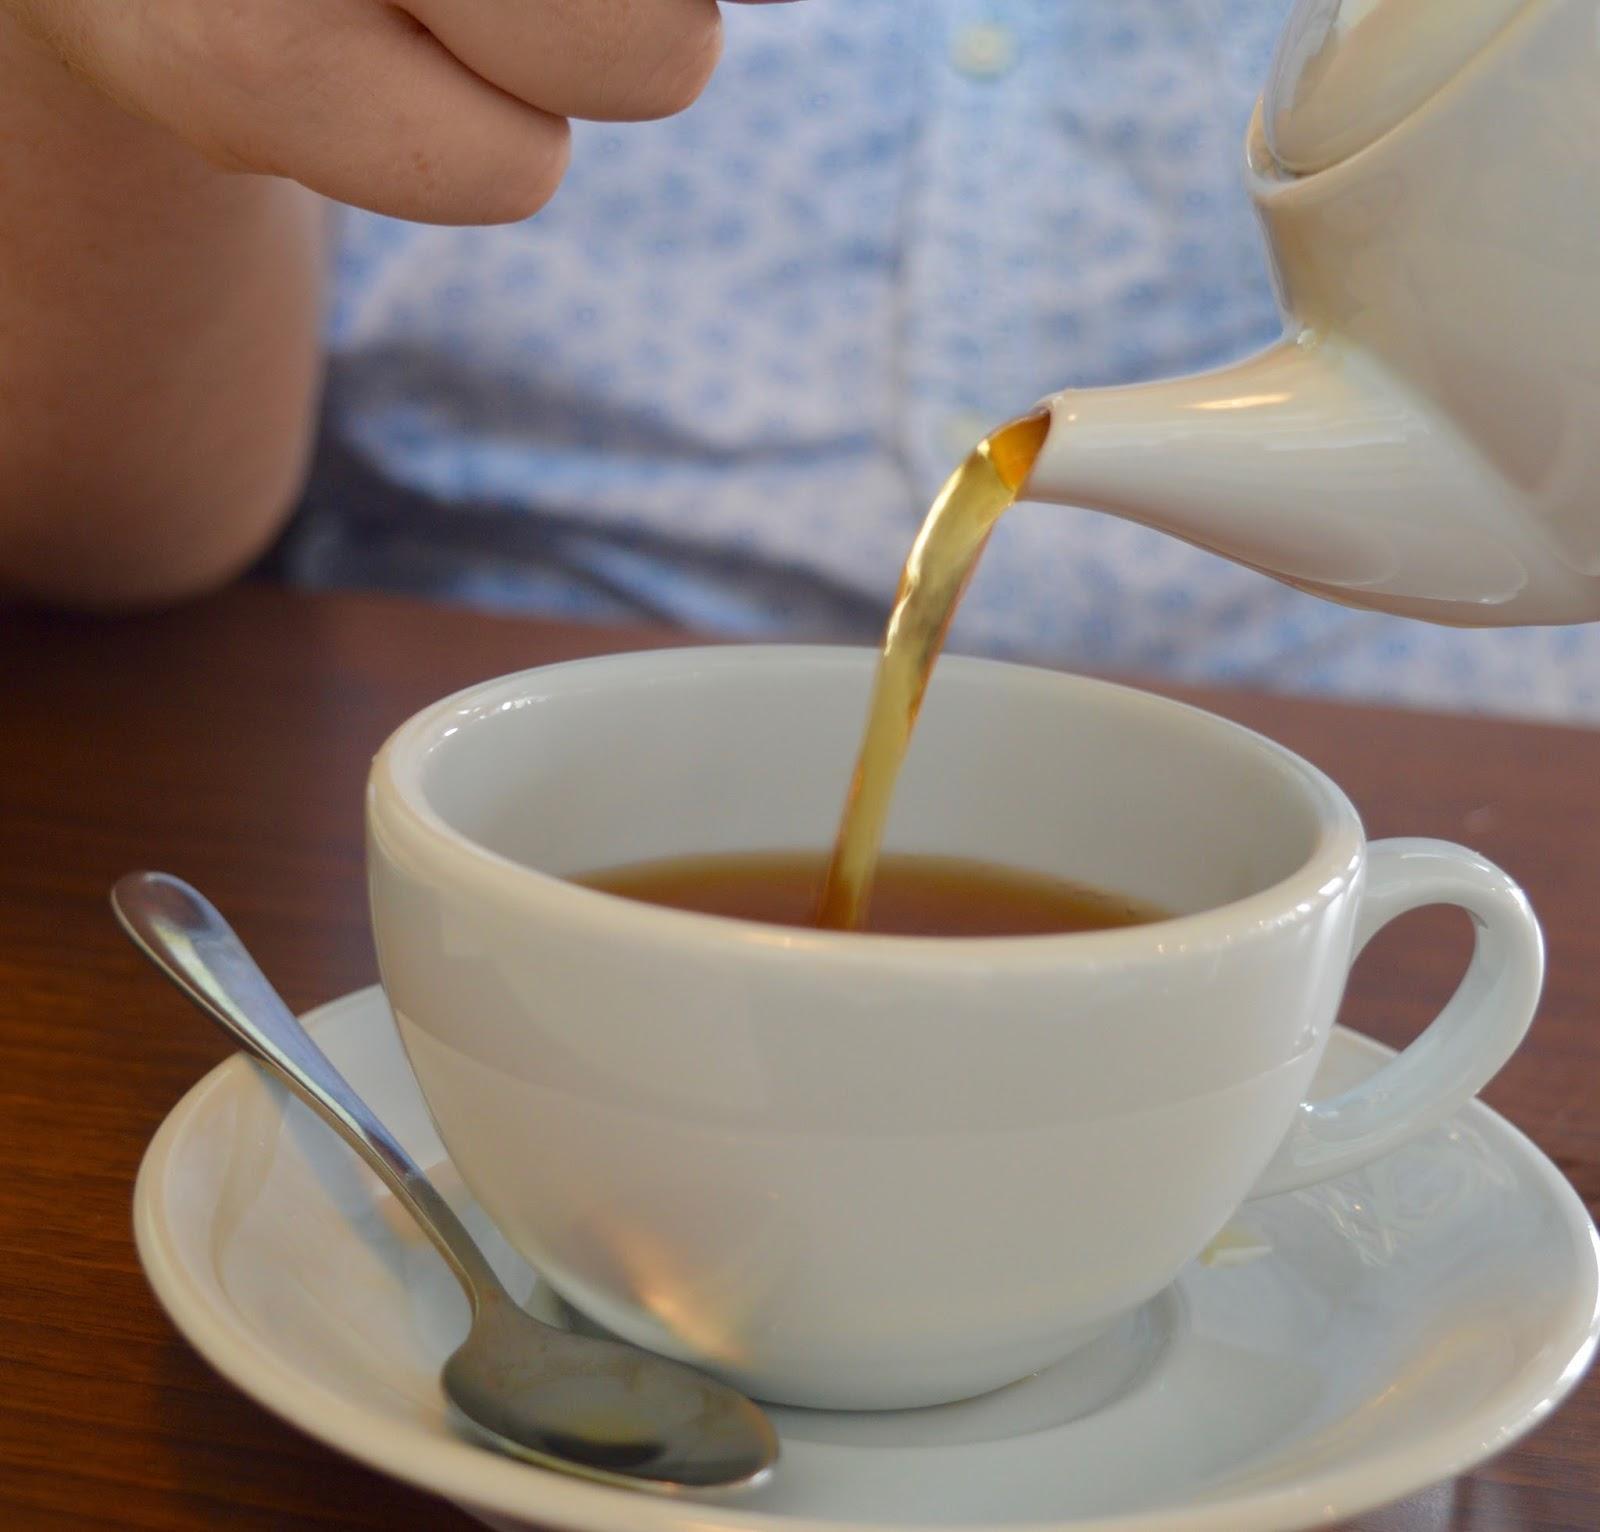 Cafe 32 | Linskill Centre, North Shields - A review - tea